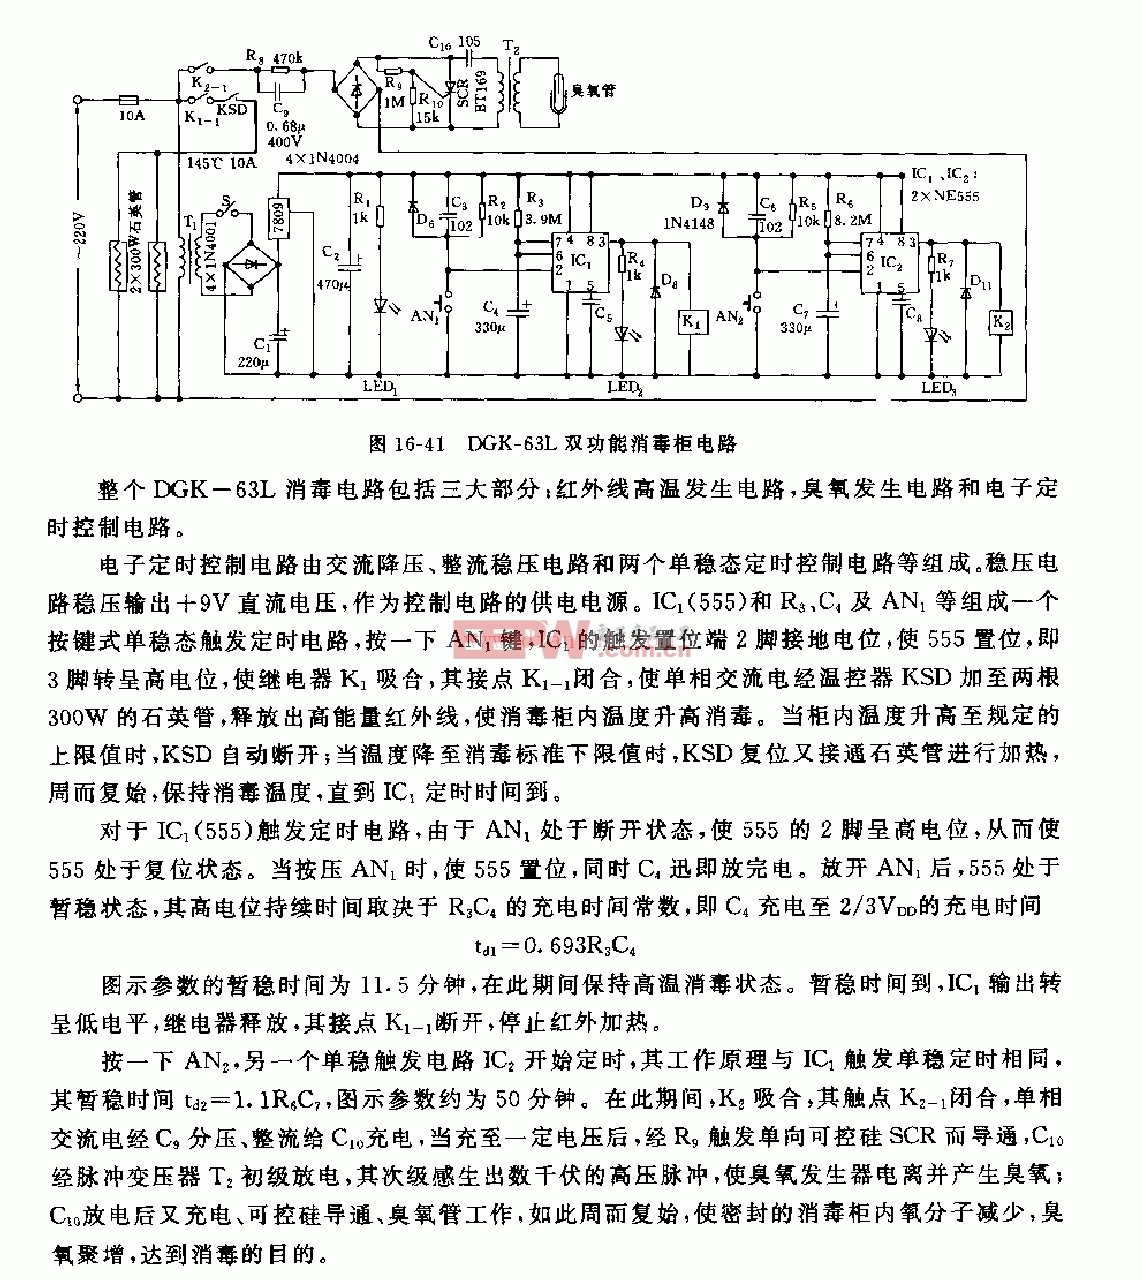 555DGK—63L双功能消毒柜电路